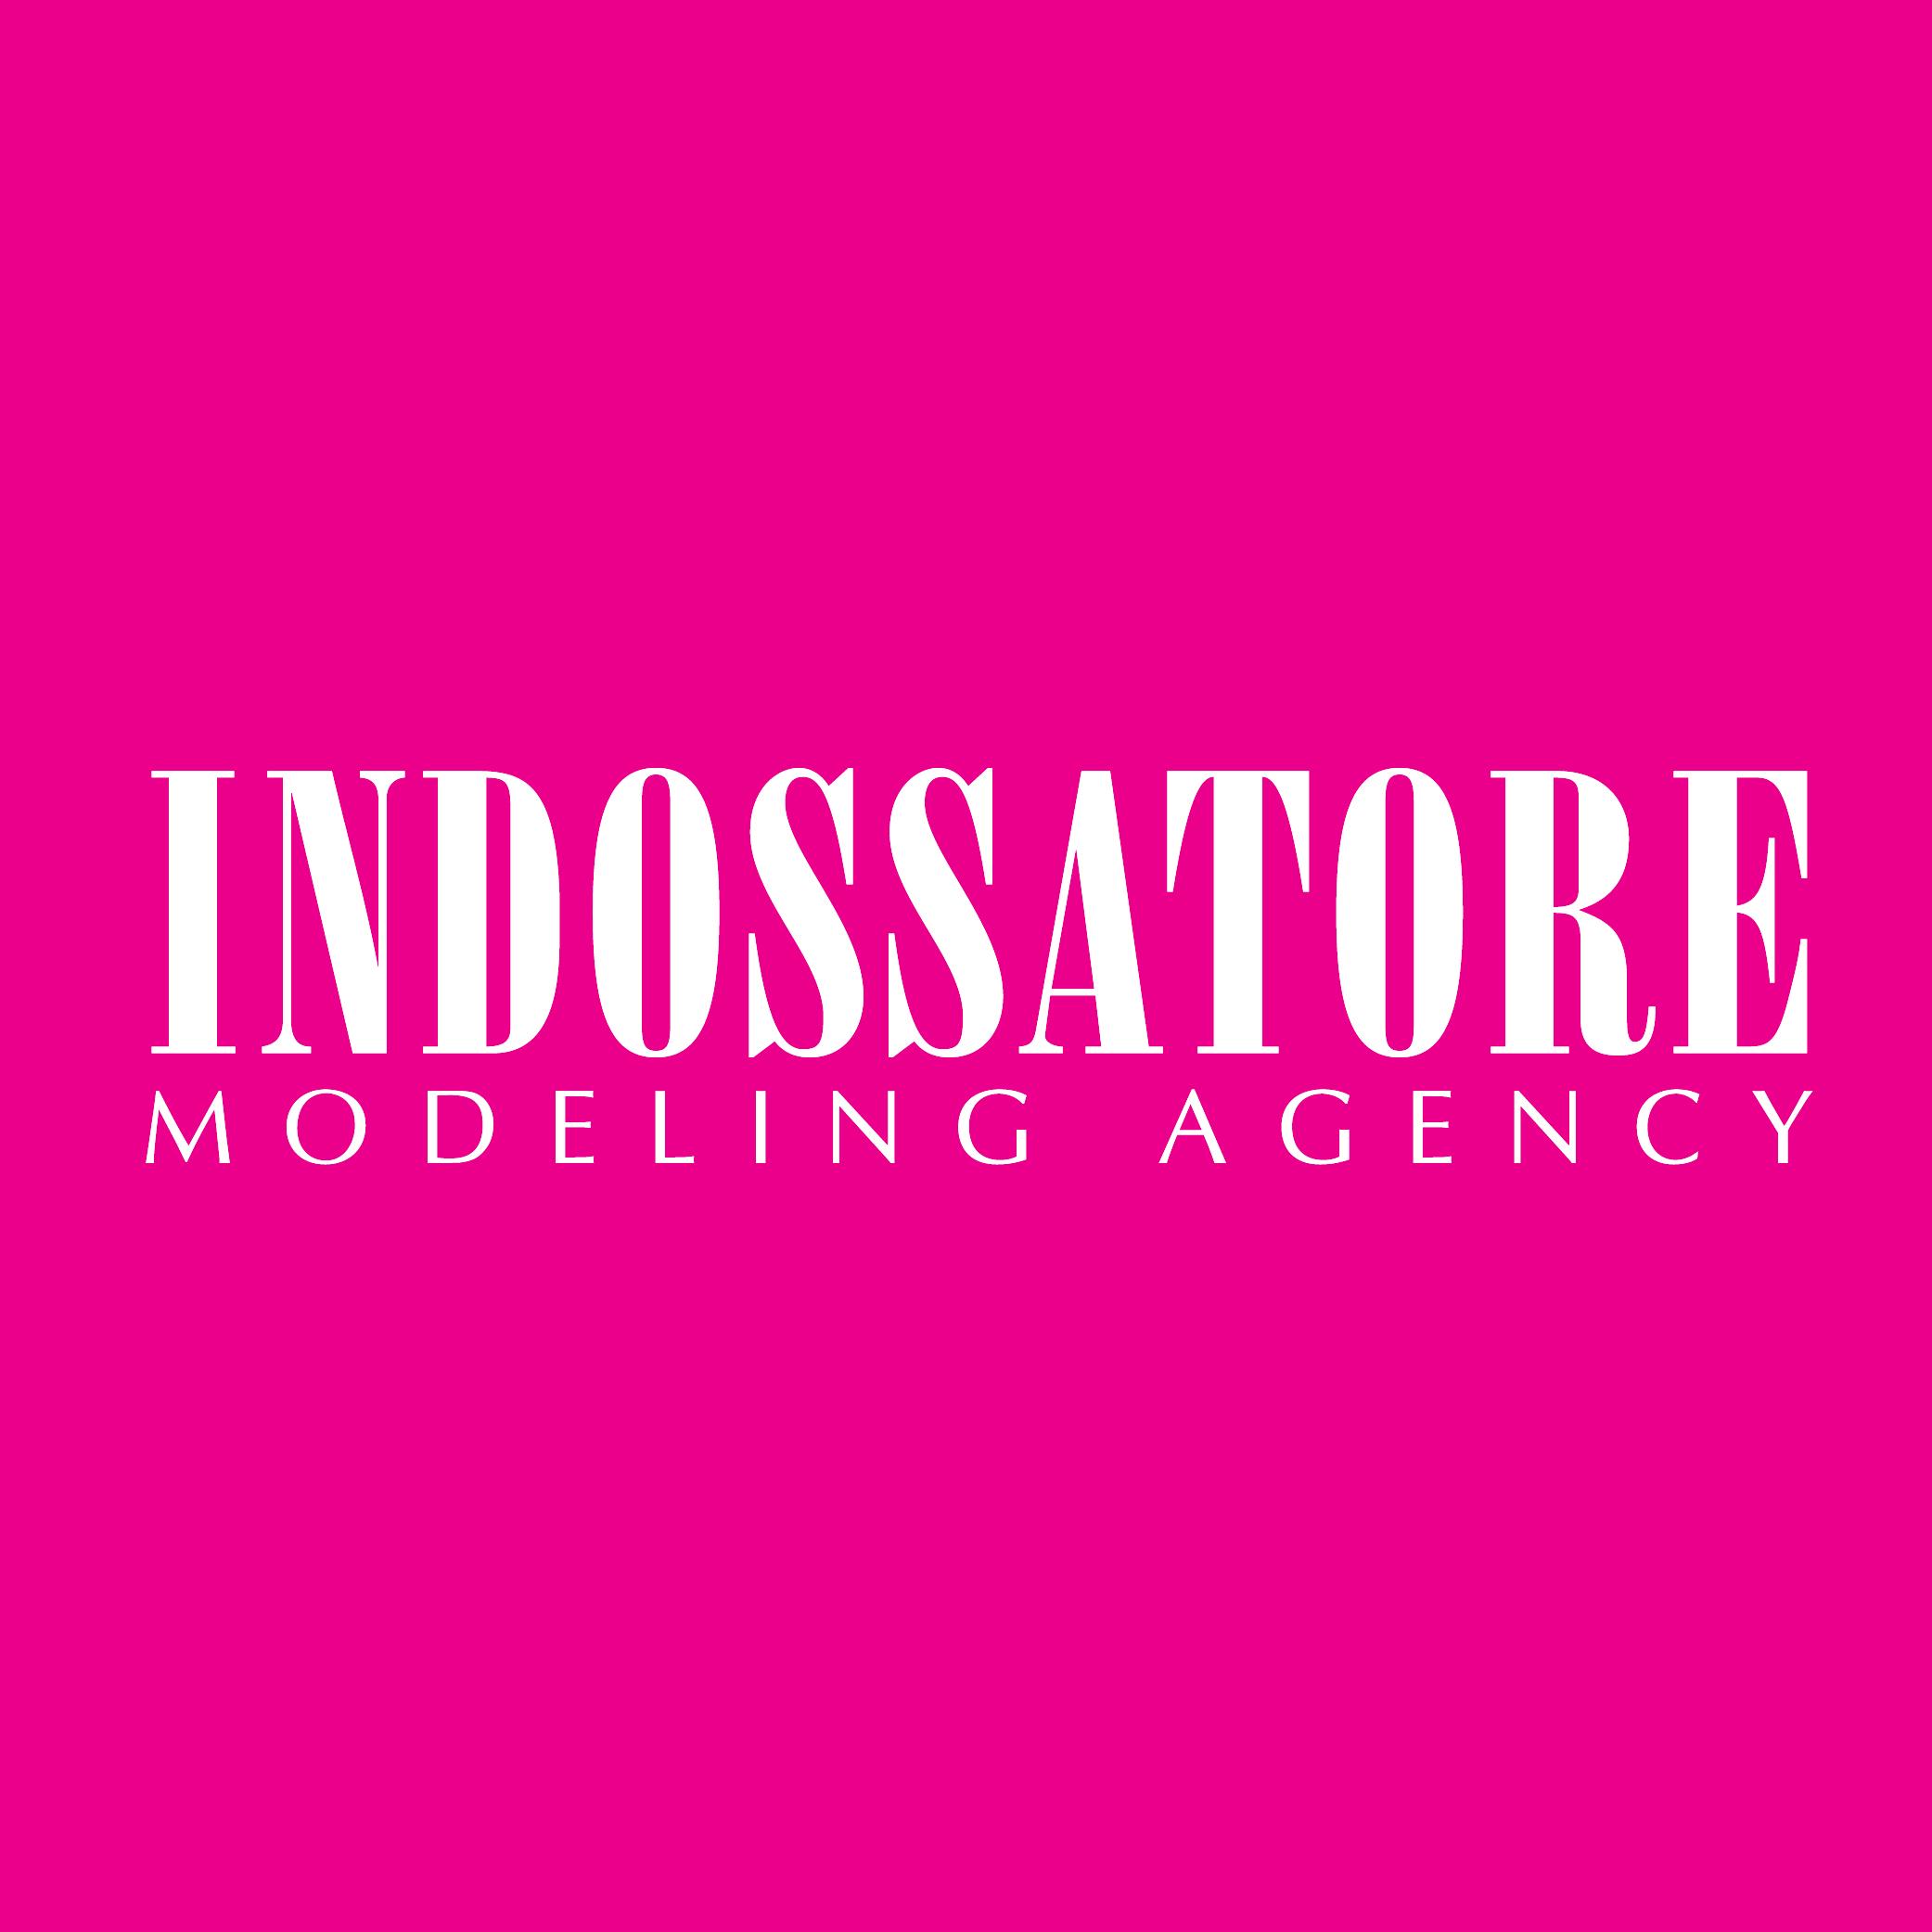 Top Modeling agency in India